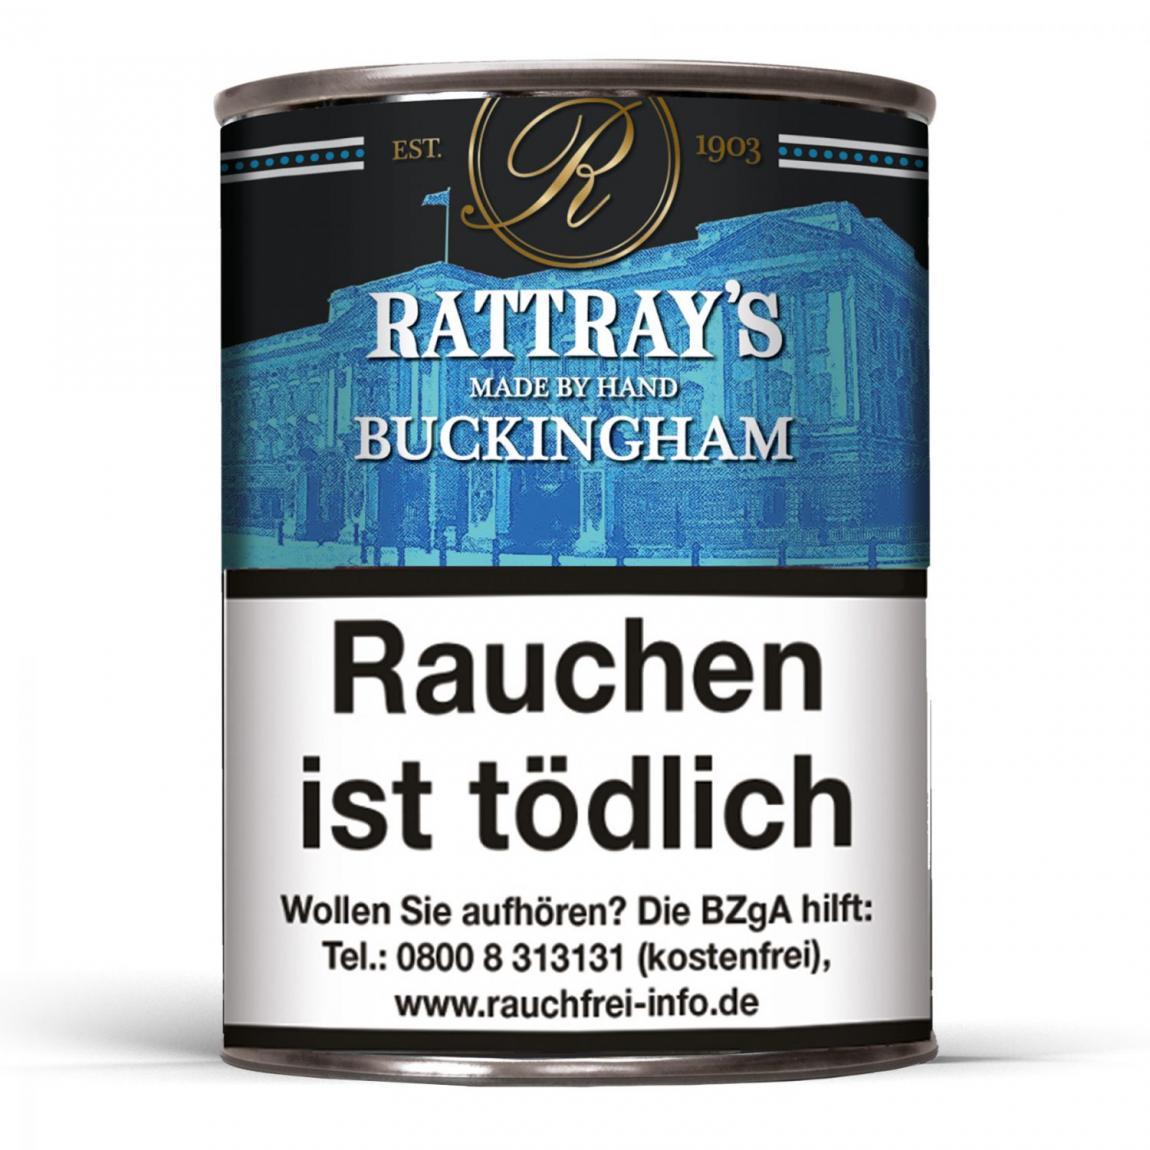 Rattray's Buckingham 100g Dose